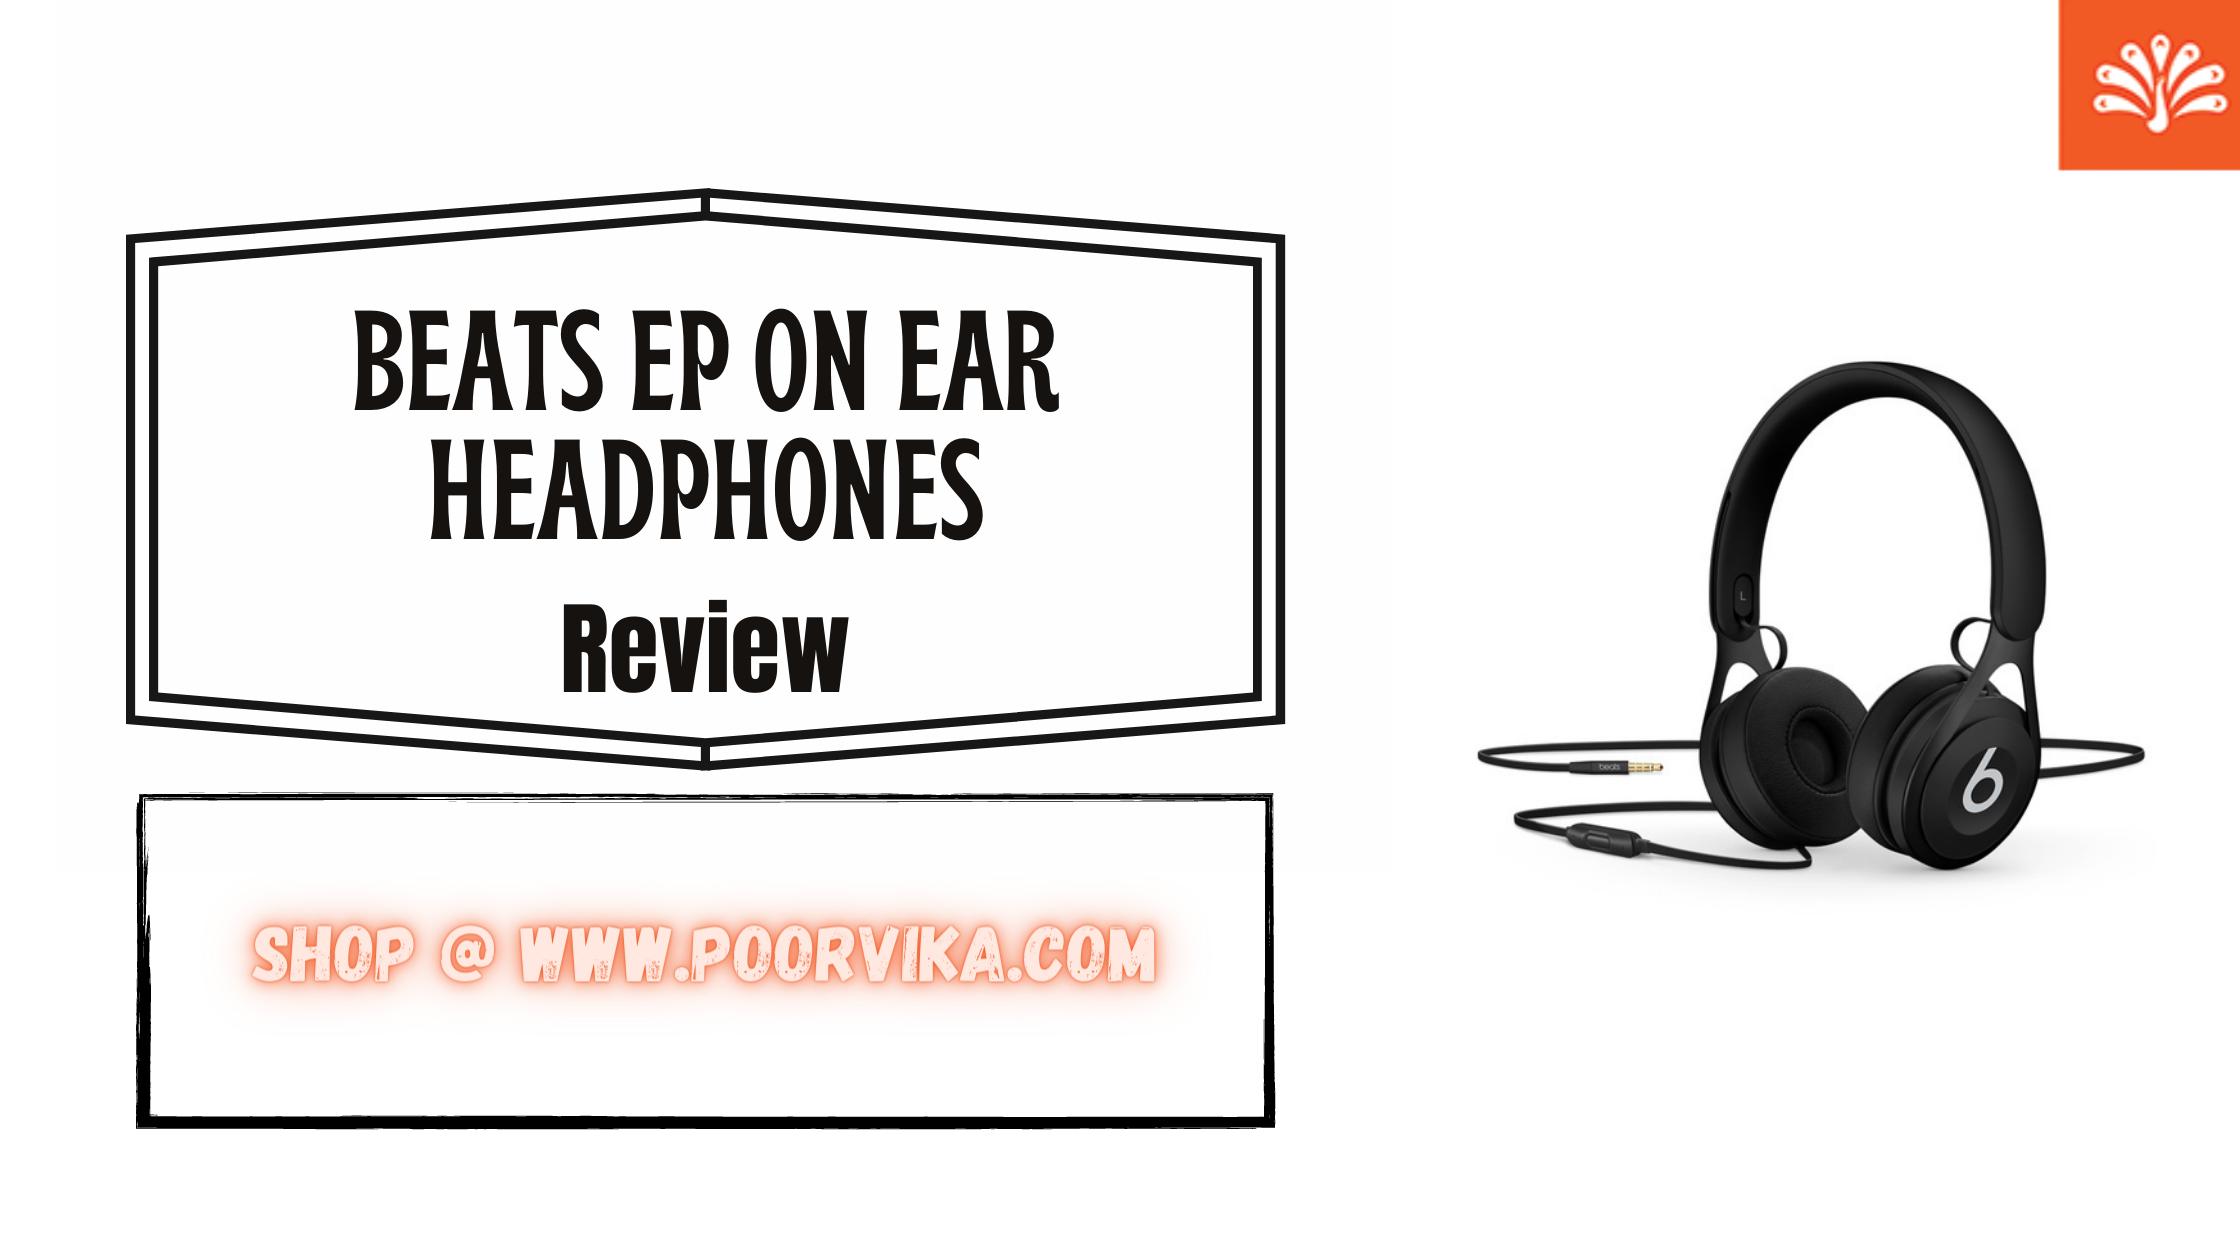 Beats EP On Ear Headphones: Review